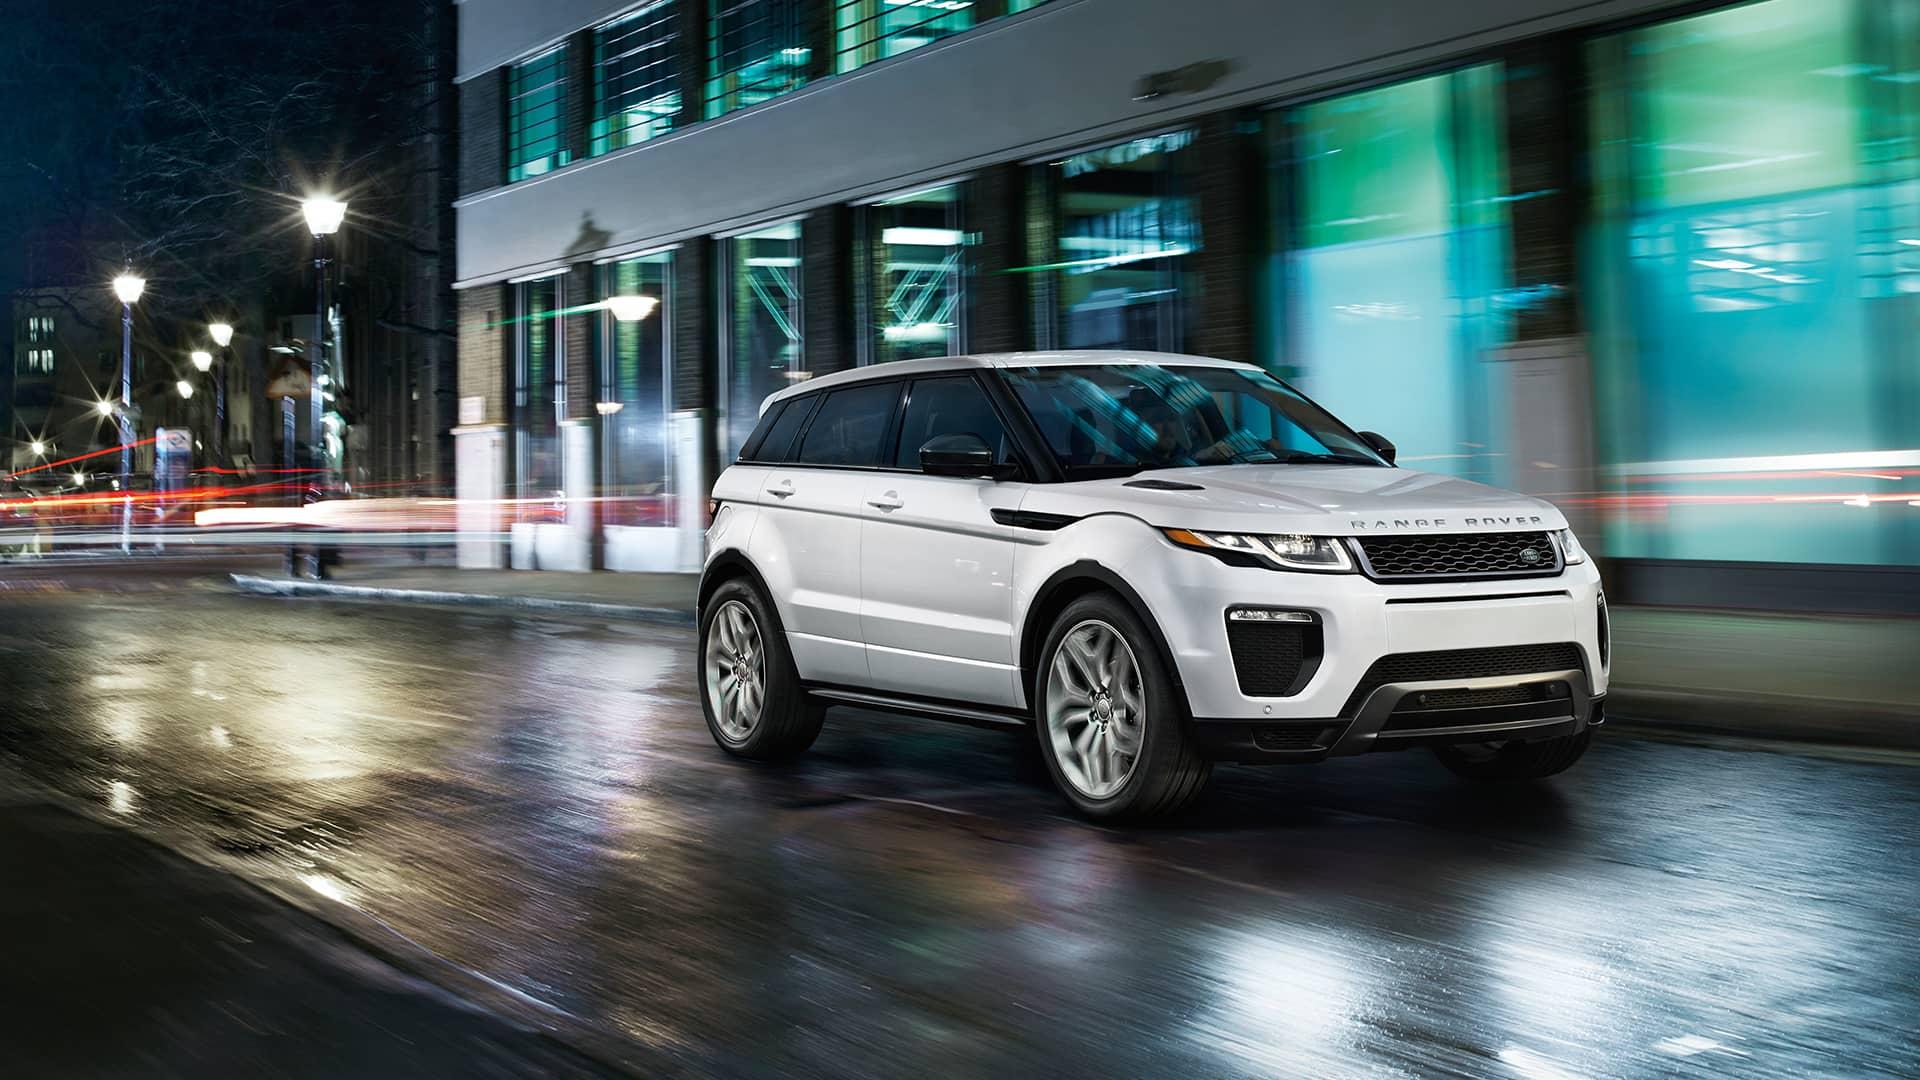 Range Rover Dealerships Land Rover Dealer In Charleston Sc Land Rover West Ashley